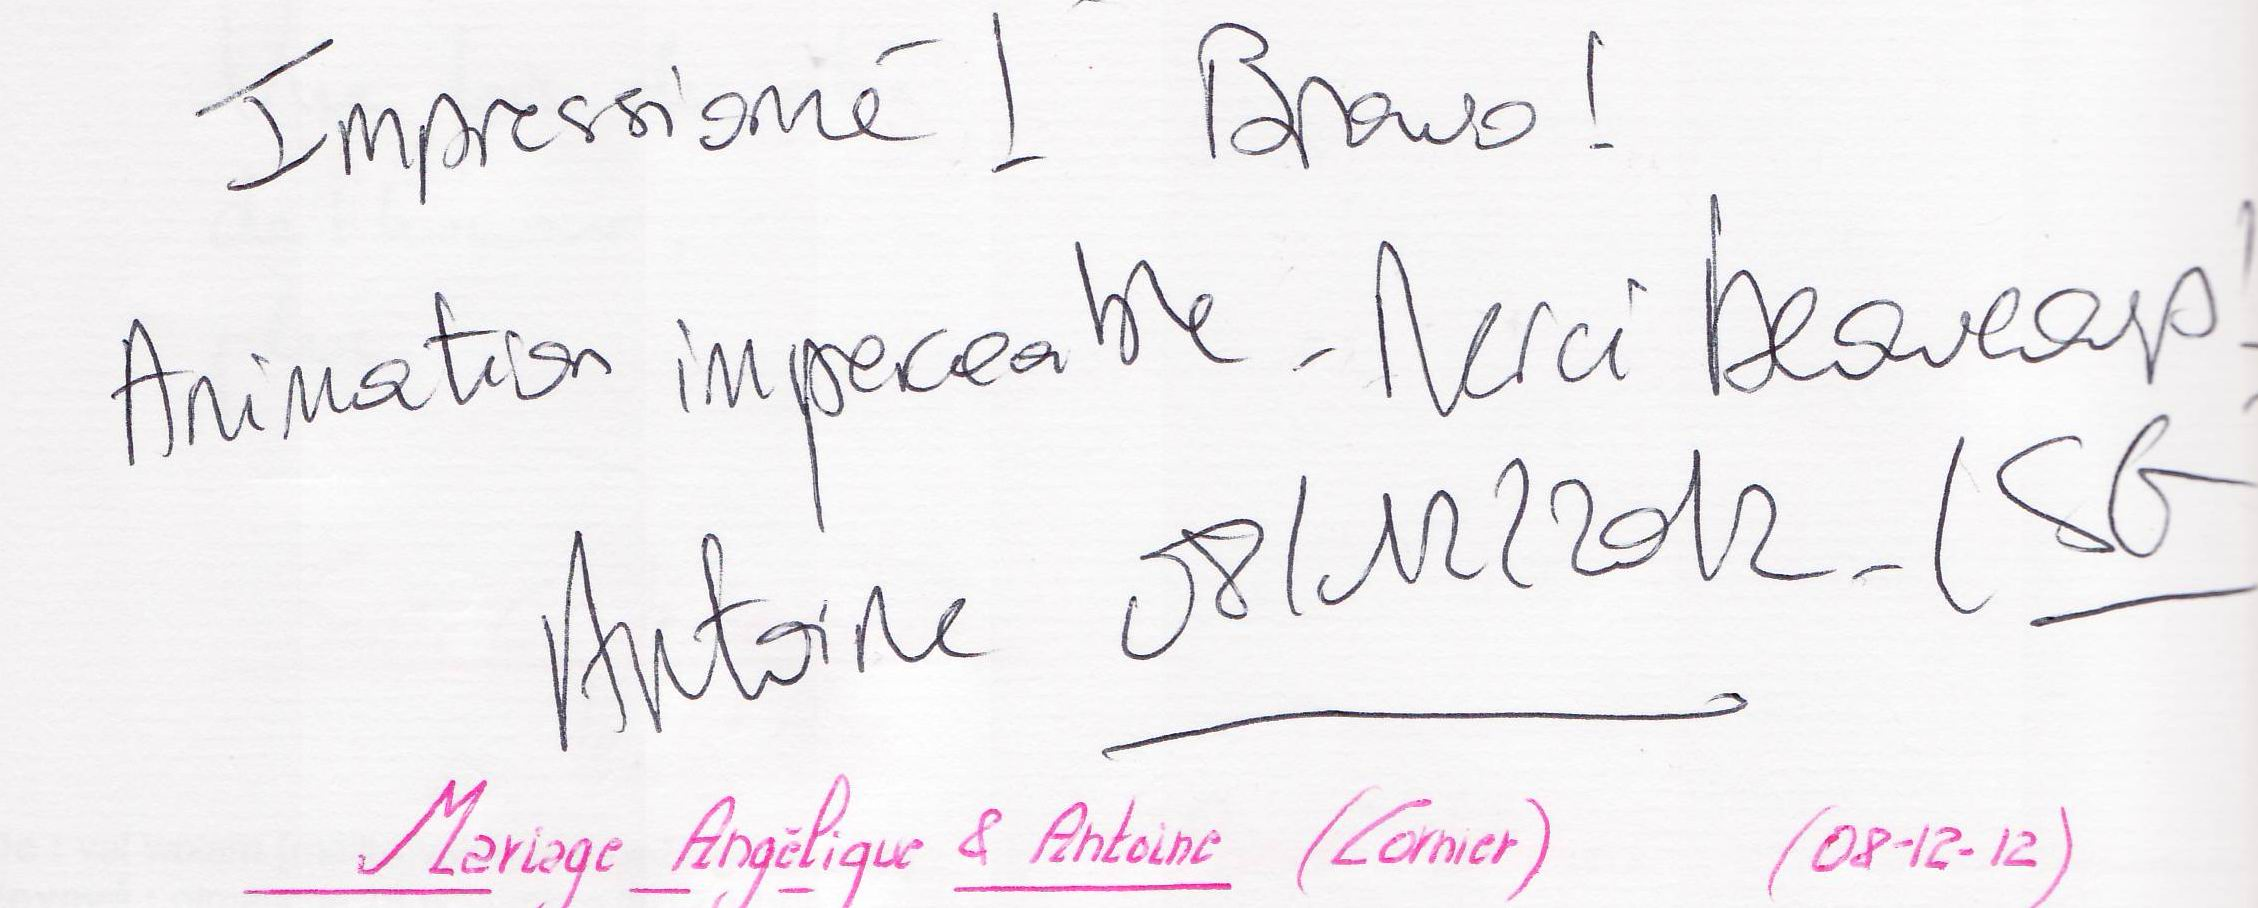 Mariage_DENIS_Antoine_&_Angélique_(Cornier)_(08-12-2012)